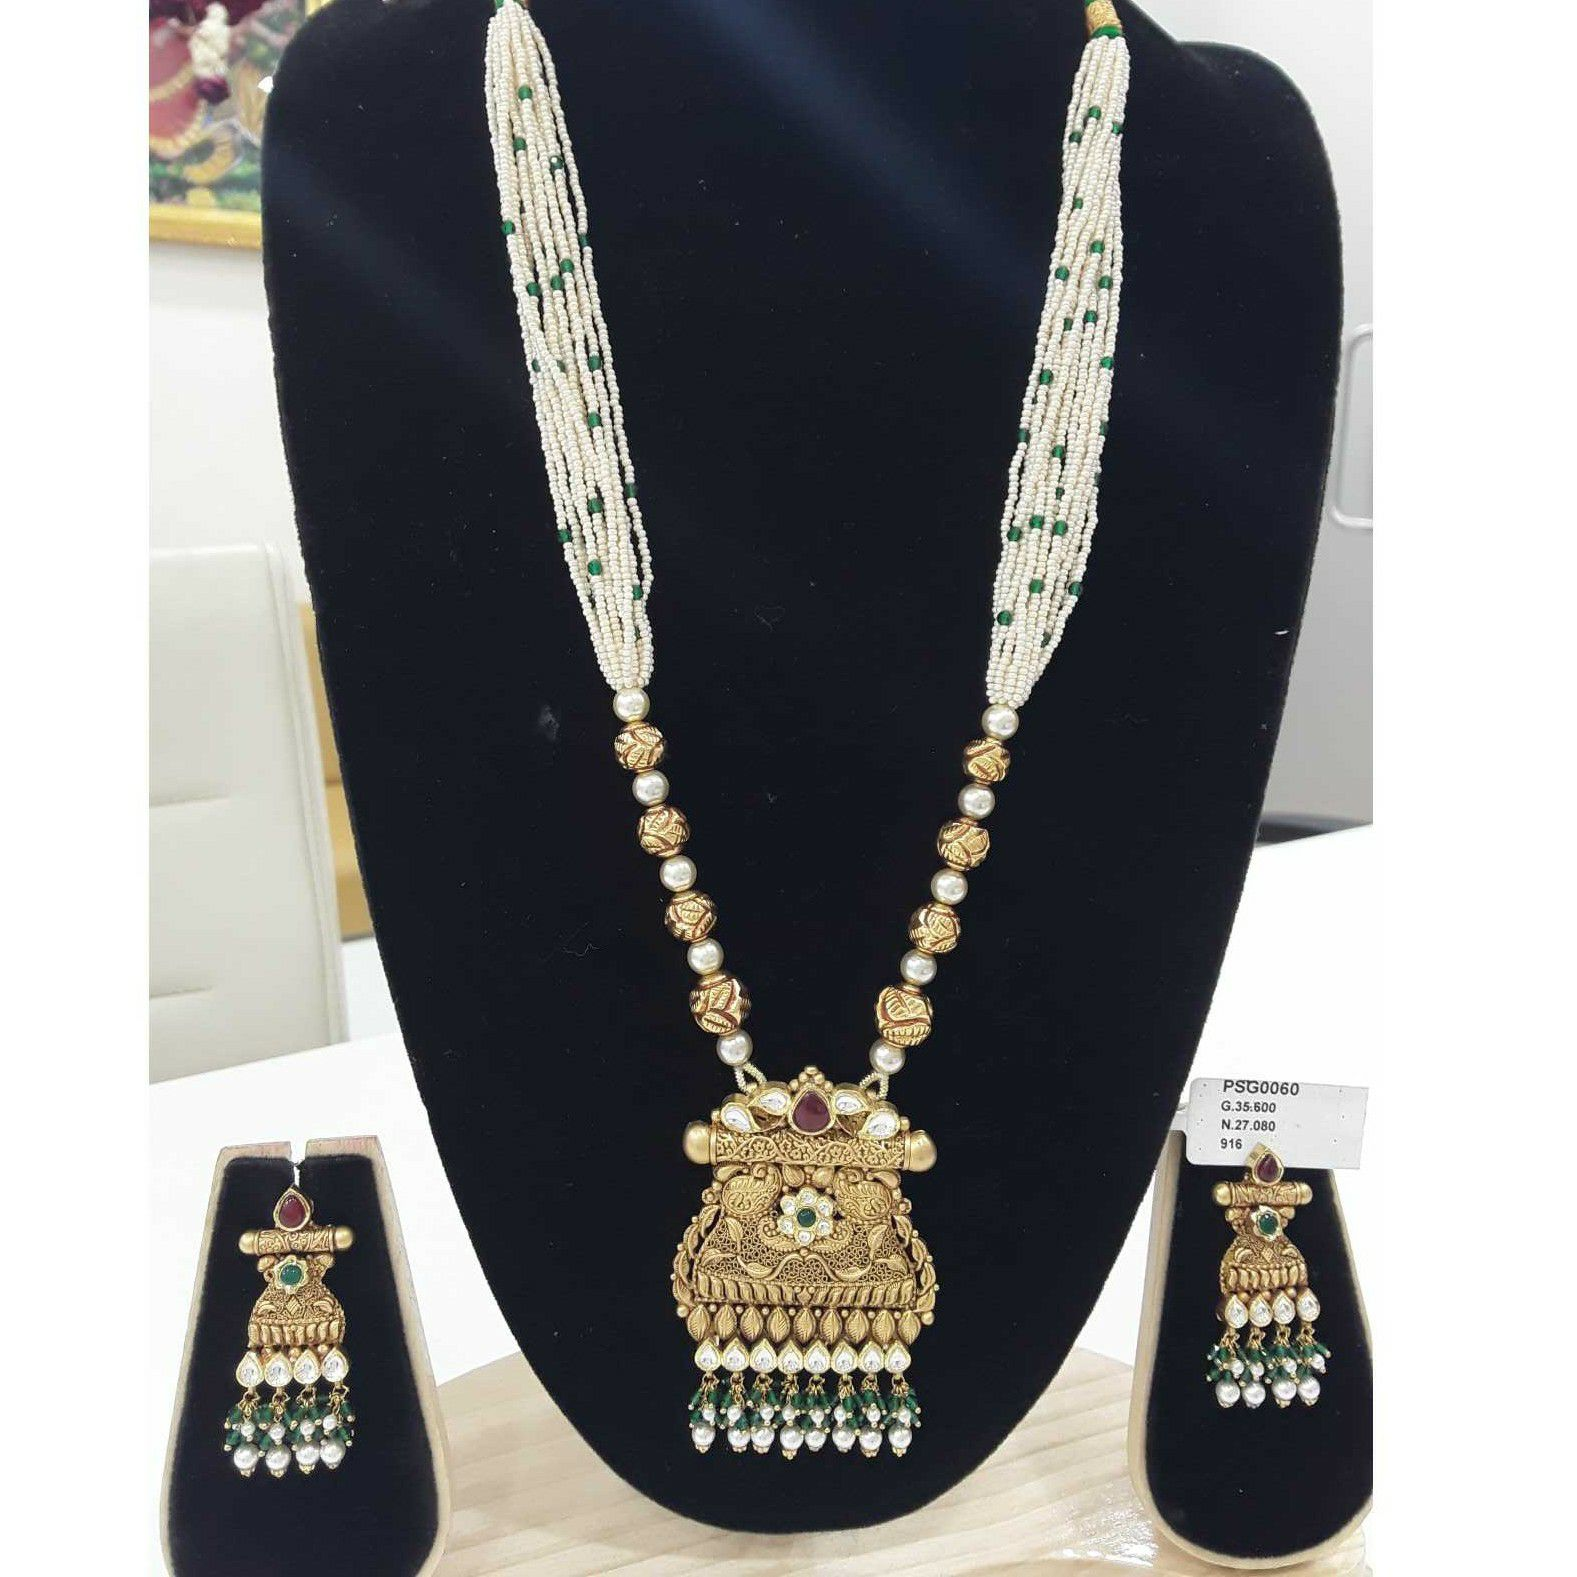 916 Antique White Chediyu Jadtar  Long Set